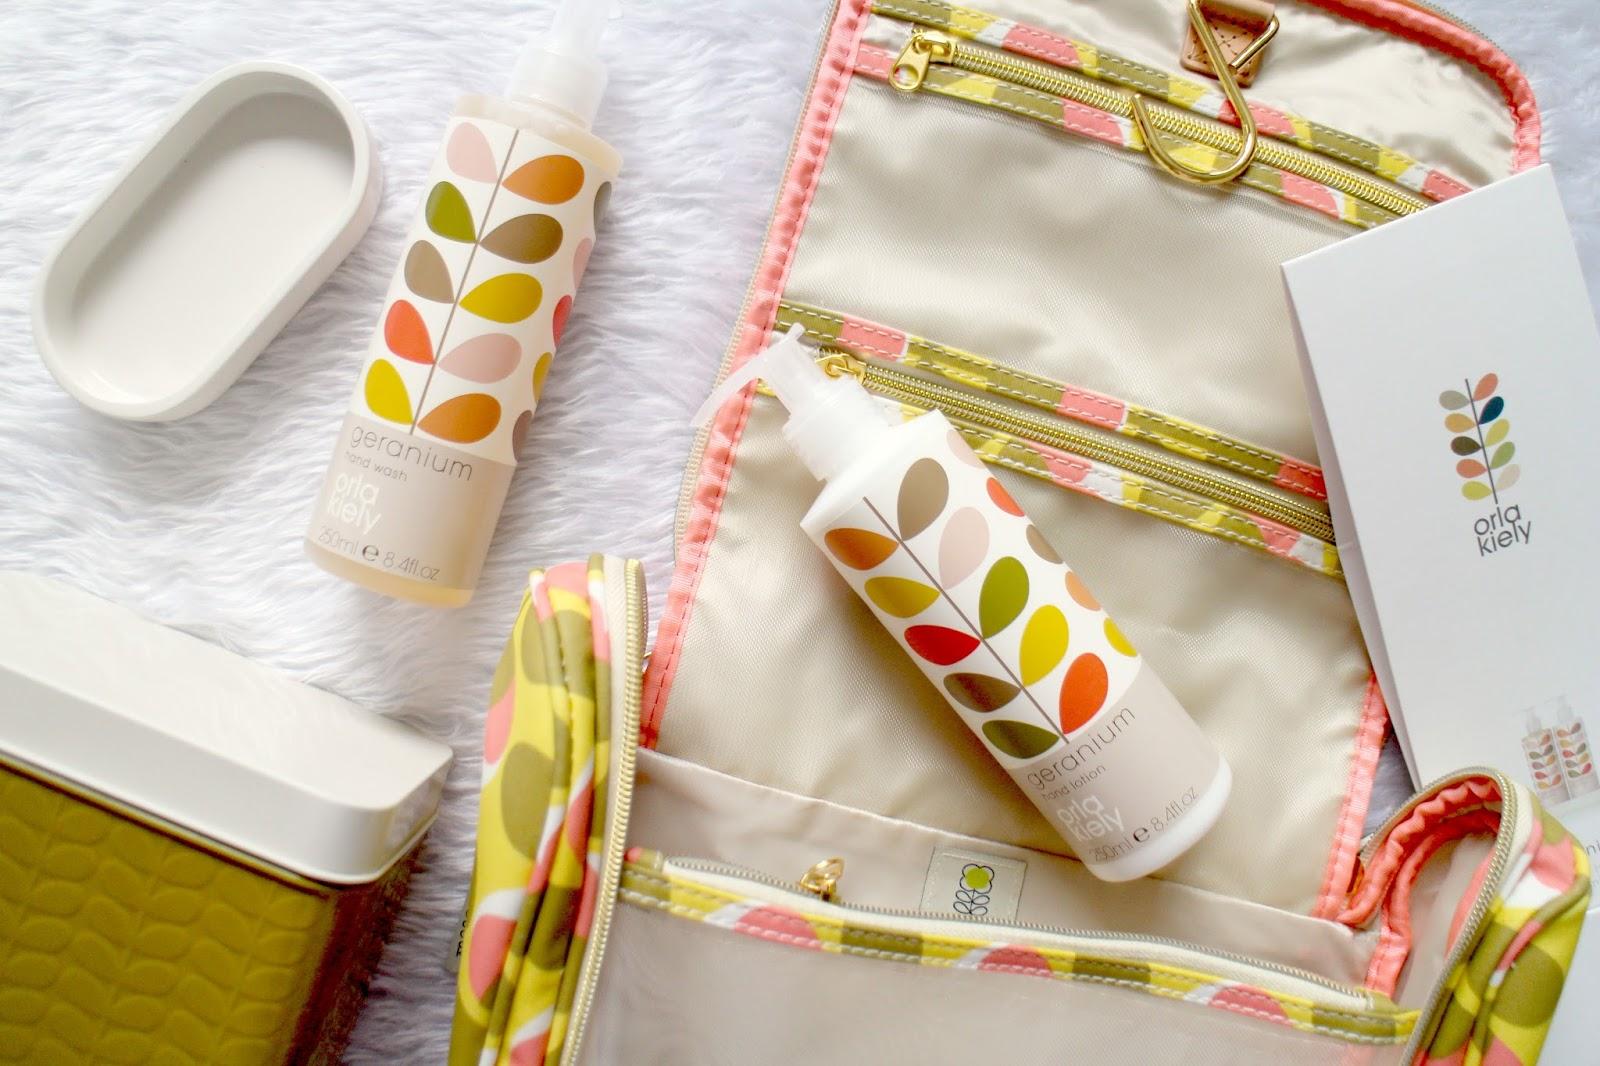 Orla Kiely Gift Ideas